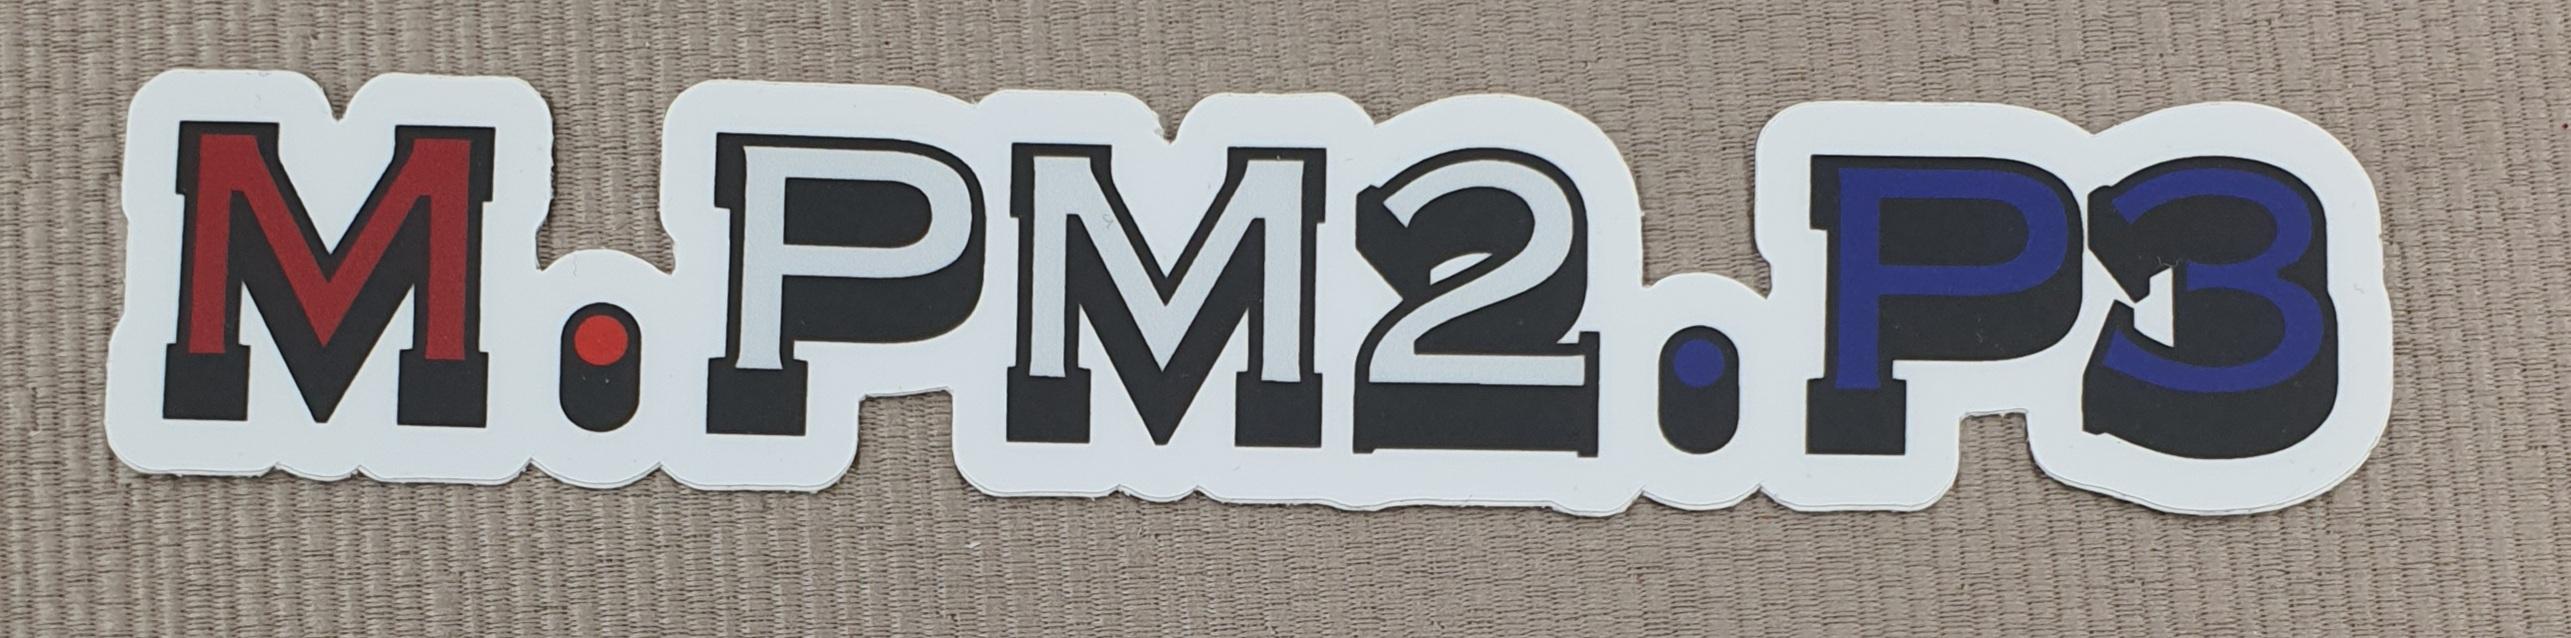 MPM2P3 sticker